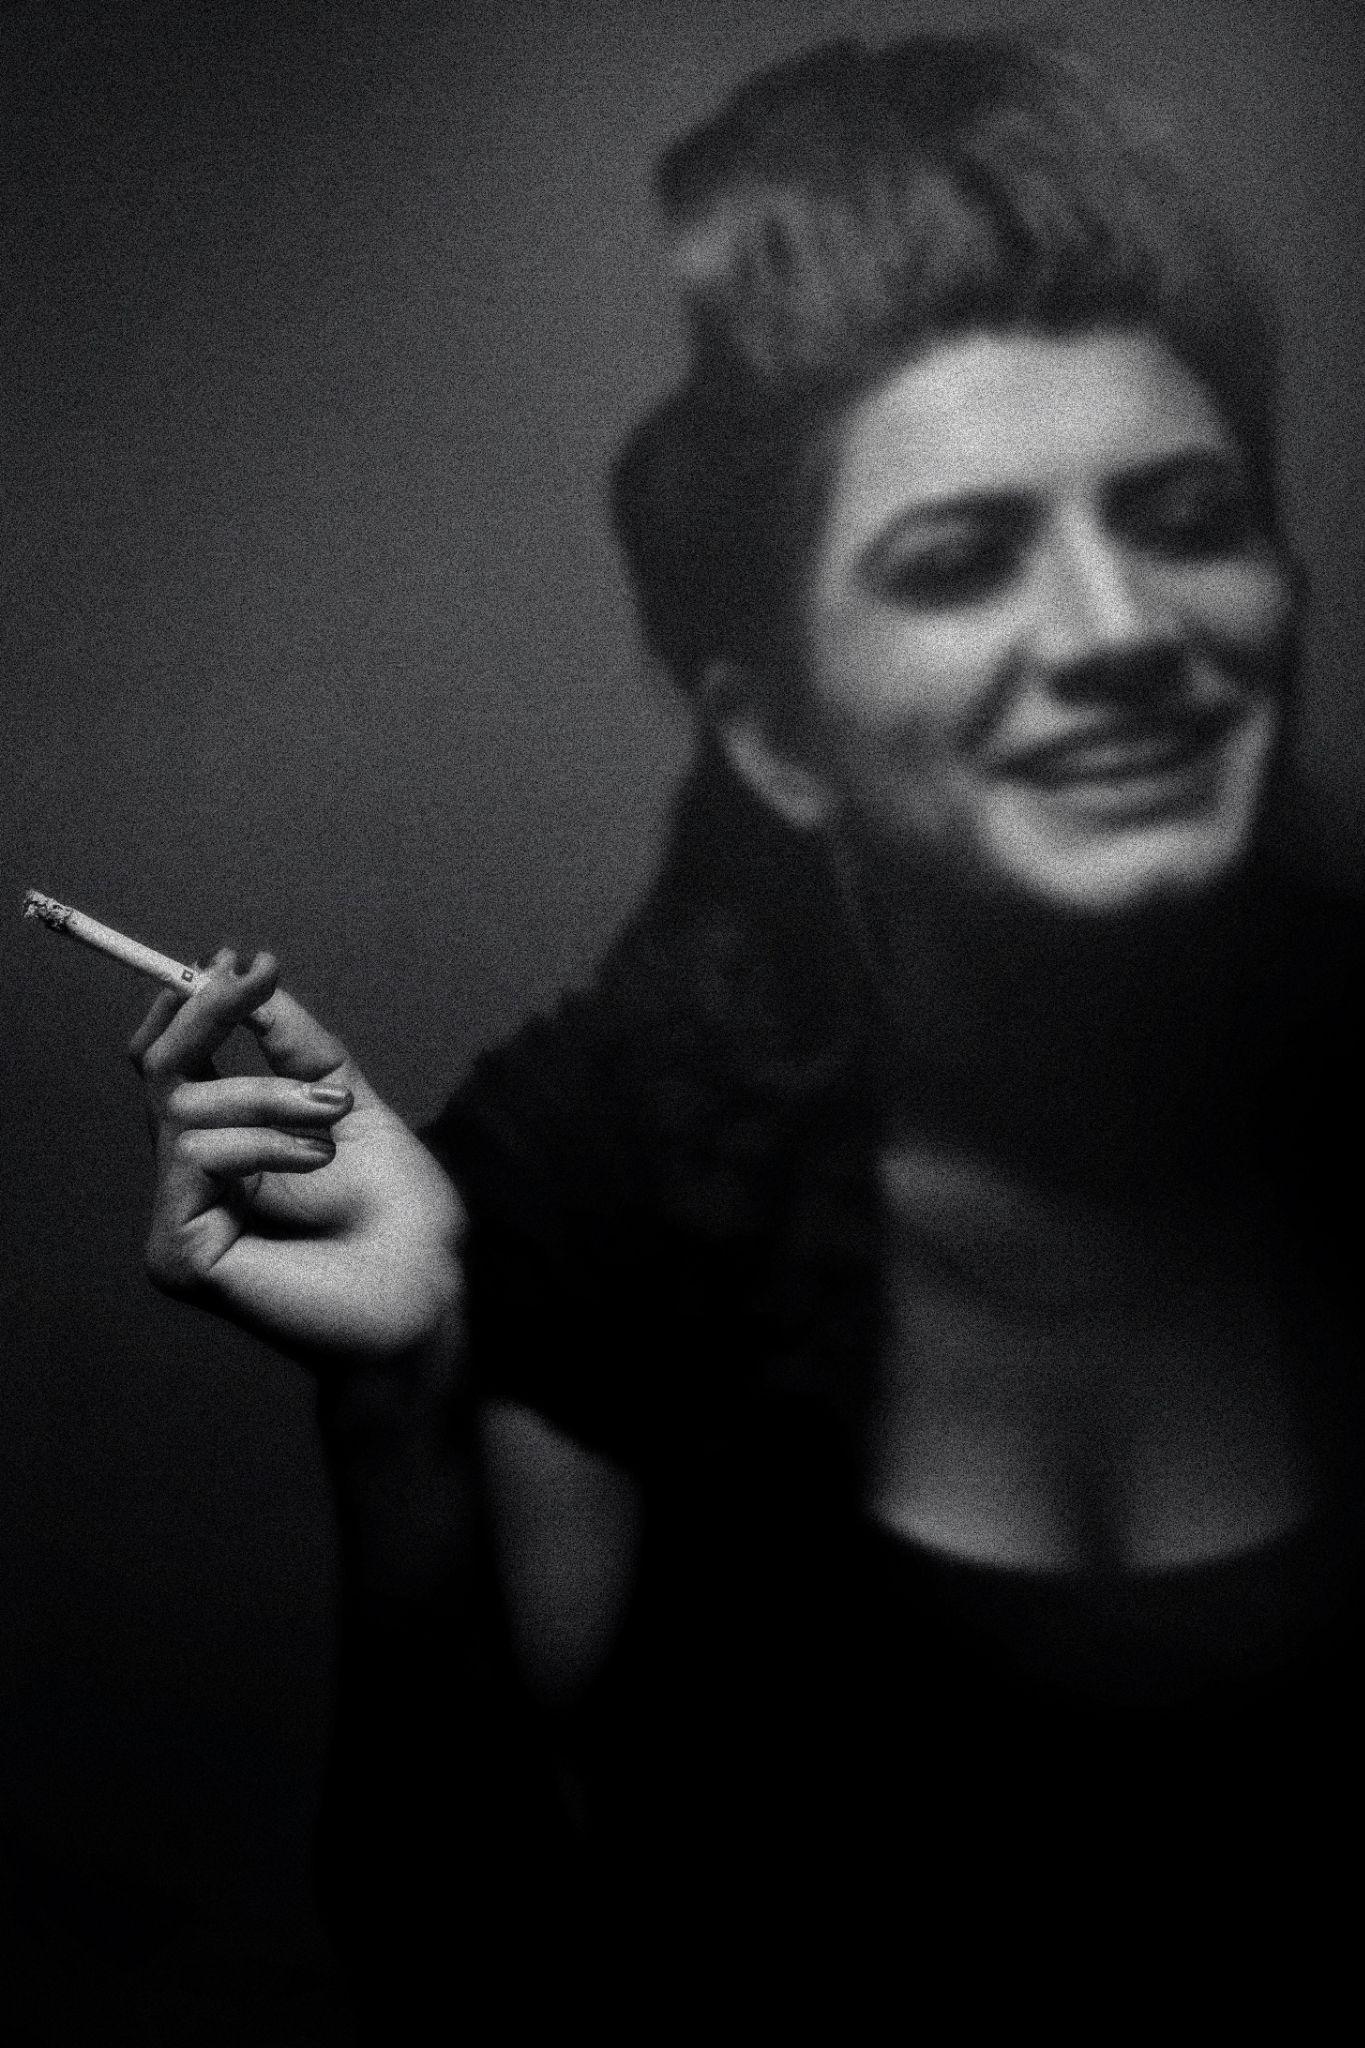 smokey by J.hussain